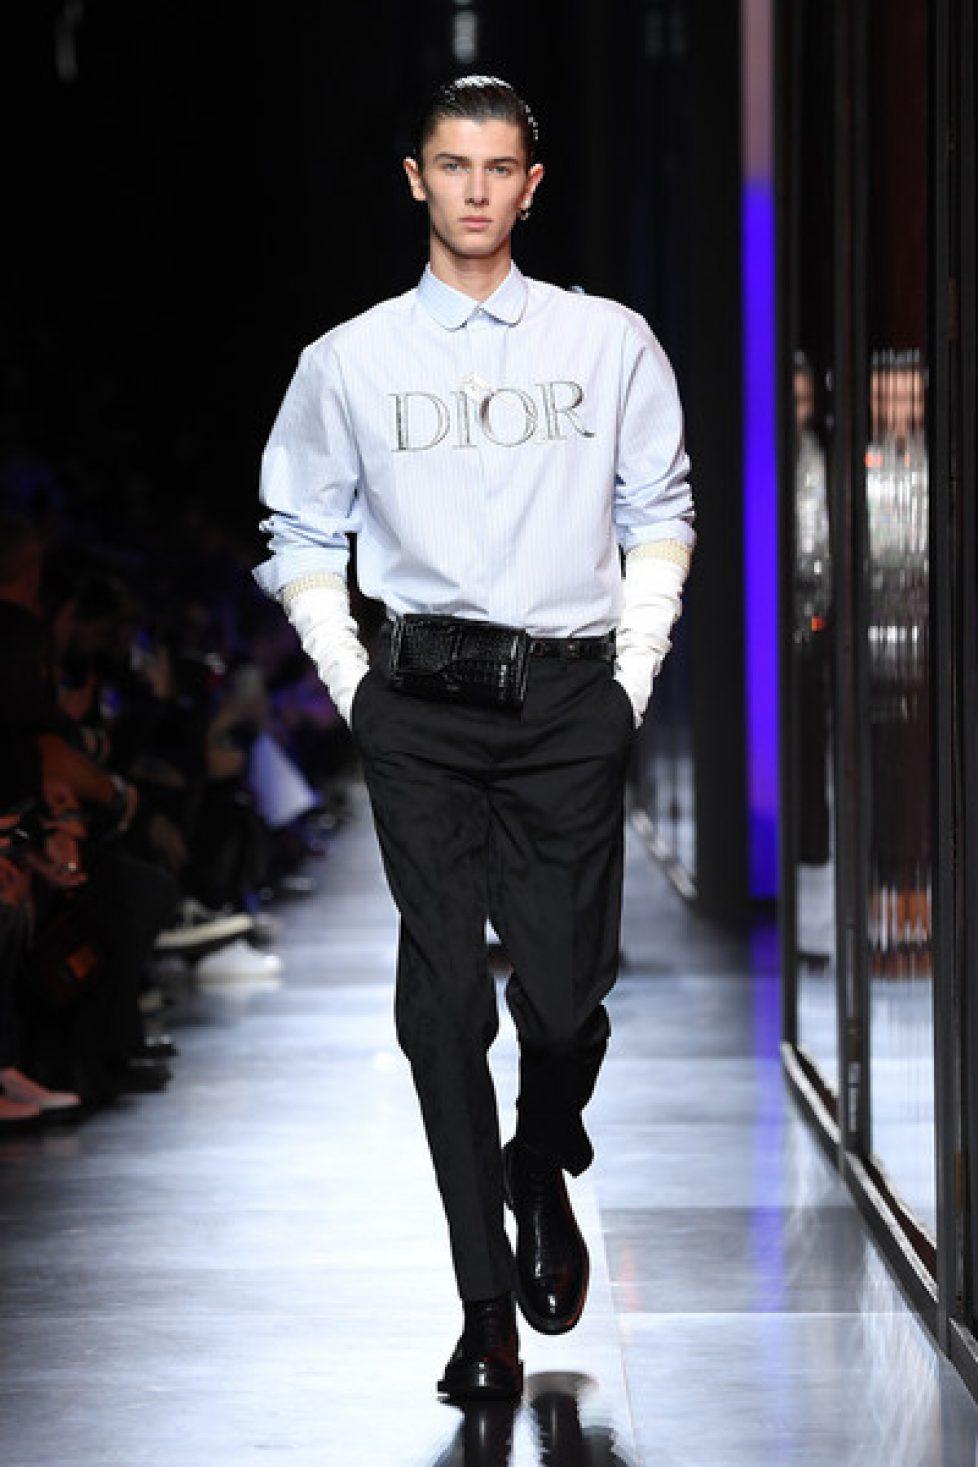 Dior+Homme+Runway+Paris+Fashion+Week+Menswear+c24tJ_fG9PIl